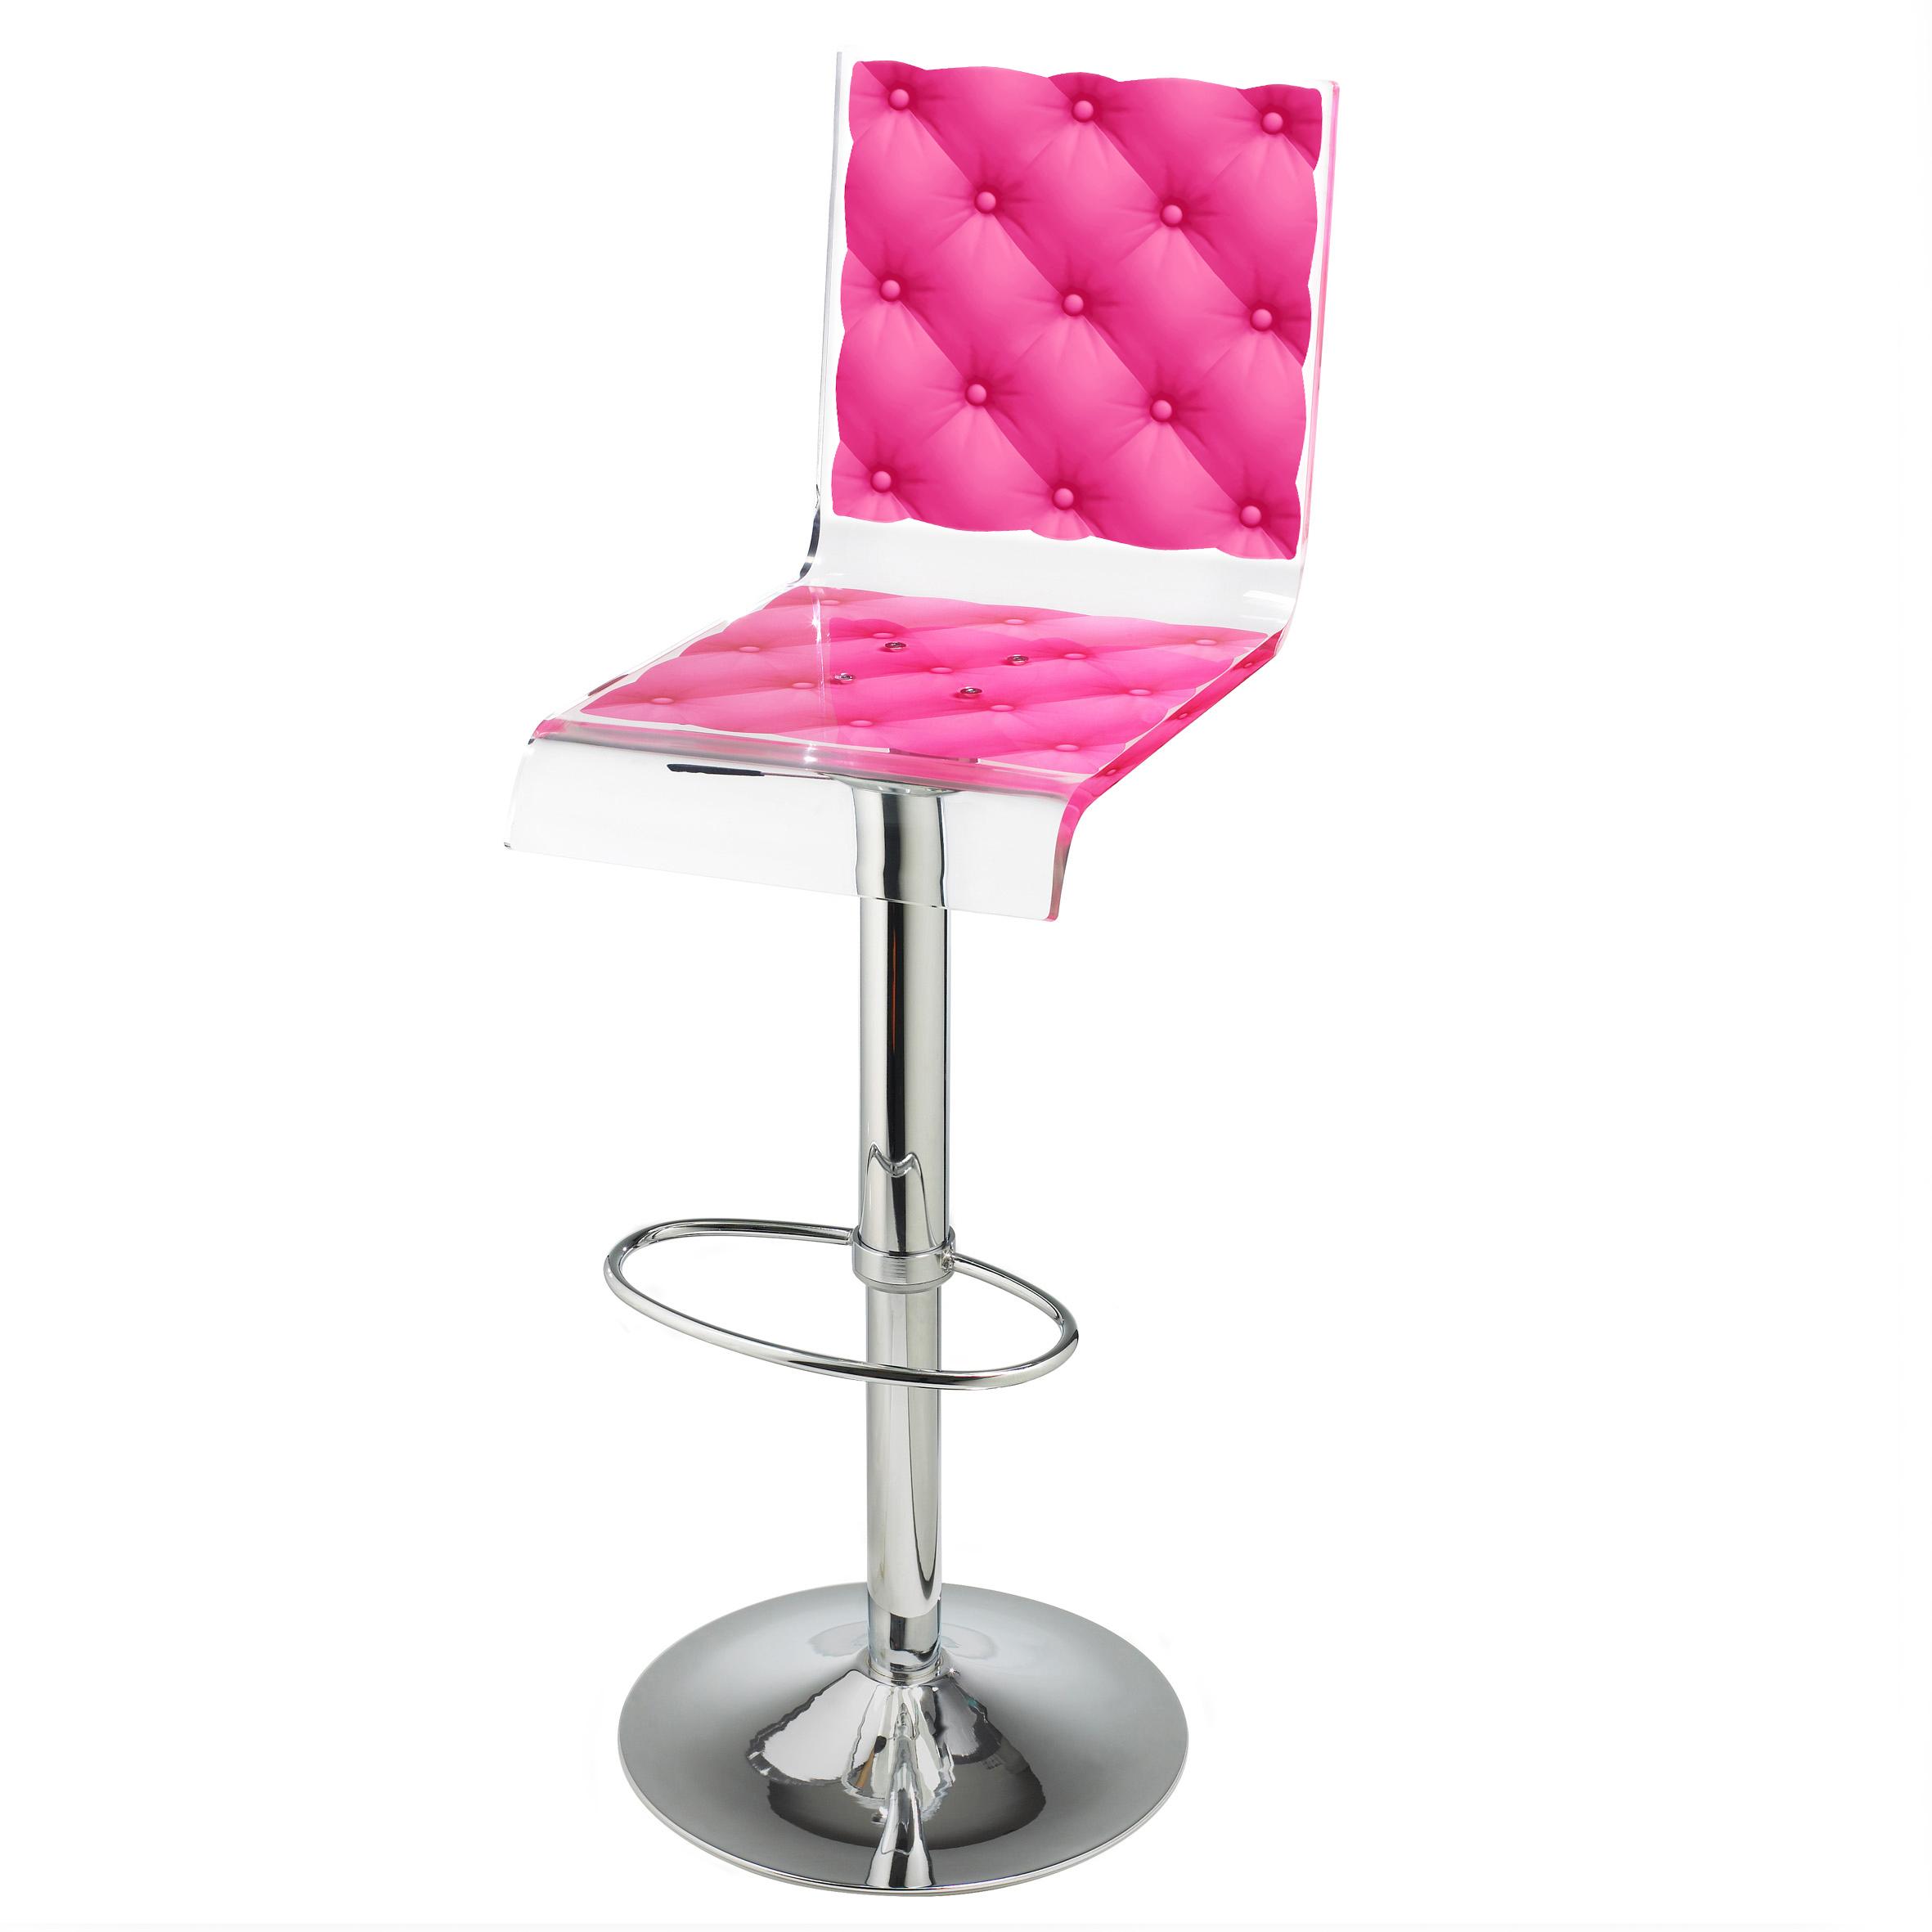 Barstool Pedestal Pink